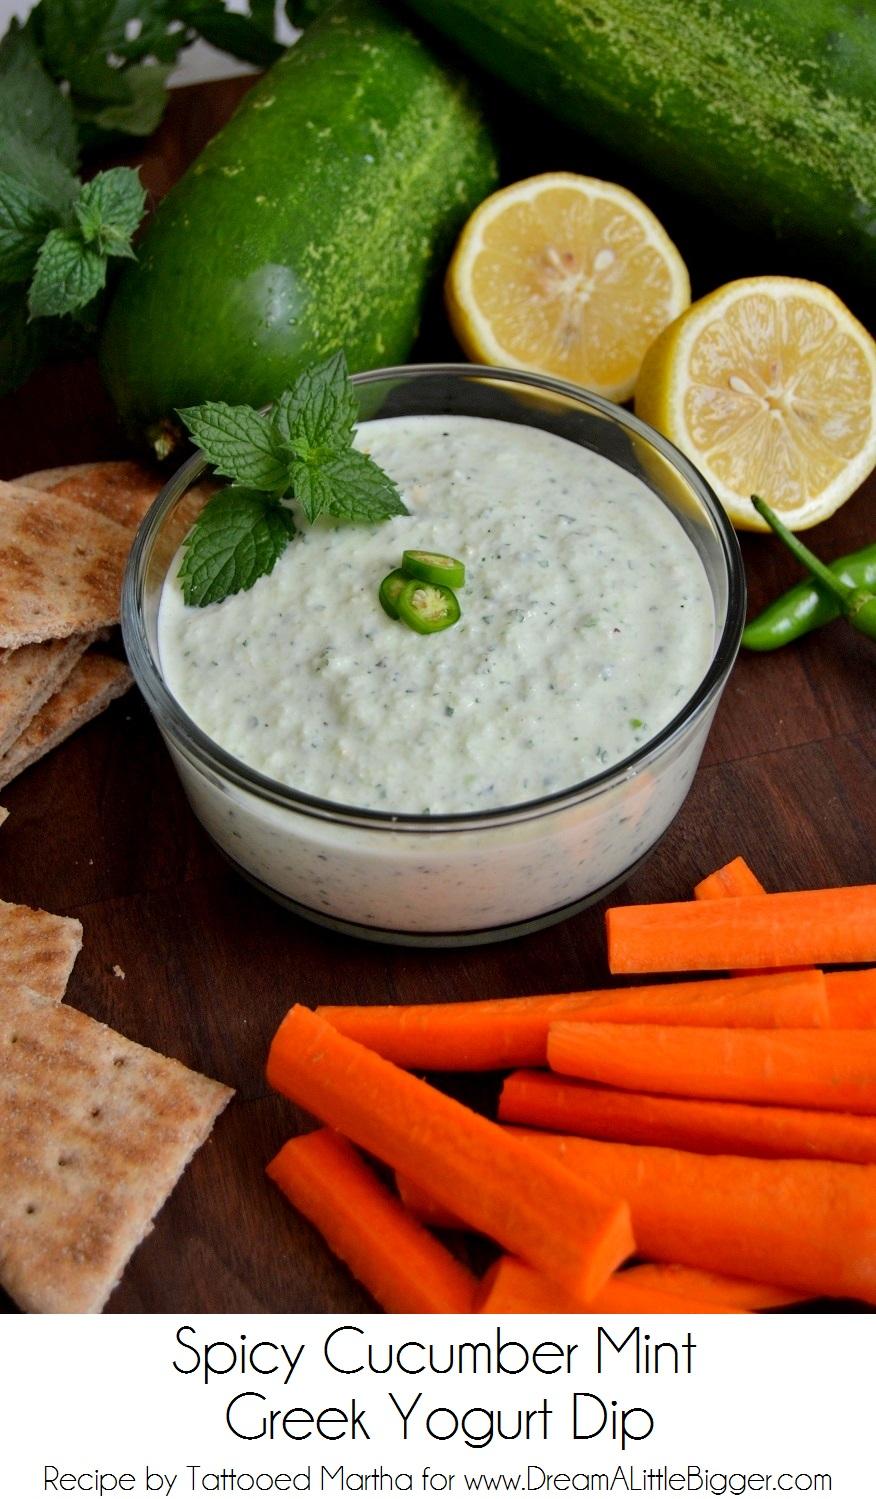 Spicy Cucumber Mint Greek Yogurt Dip at DALB